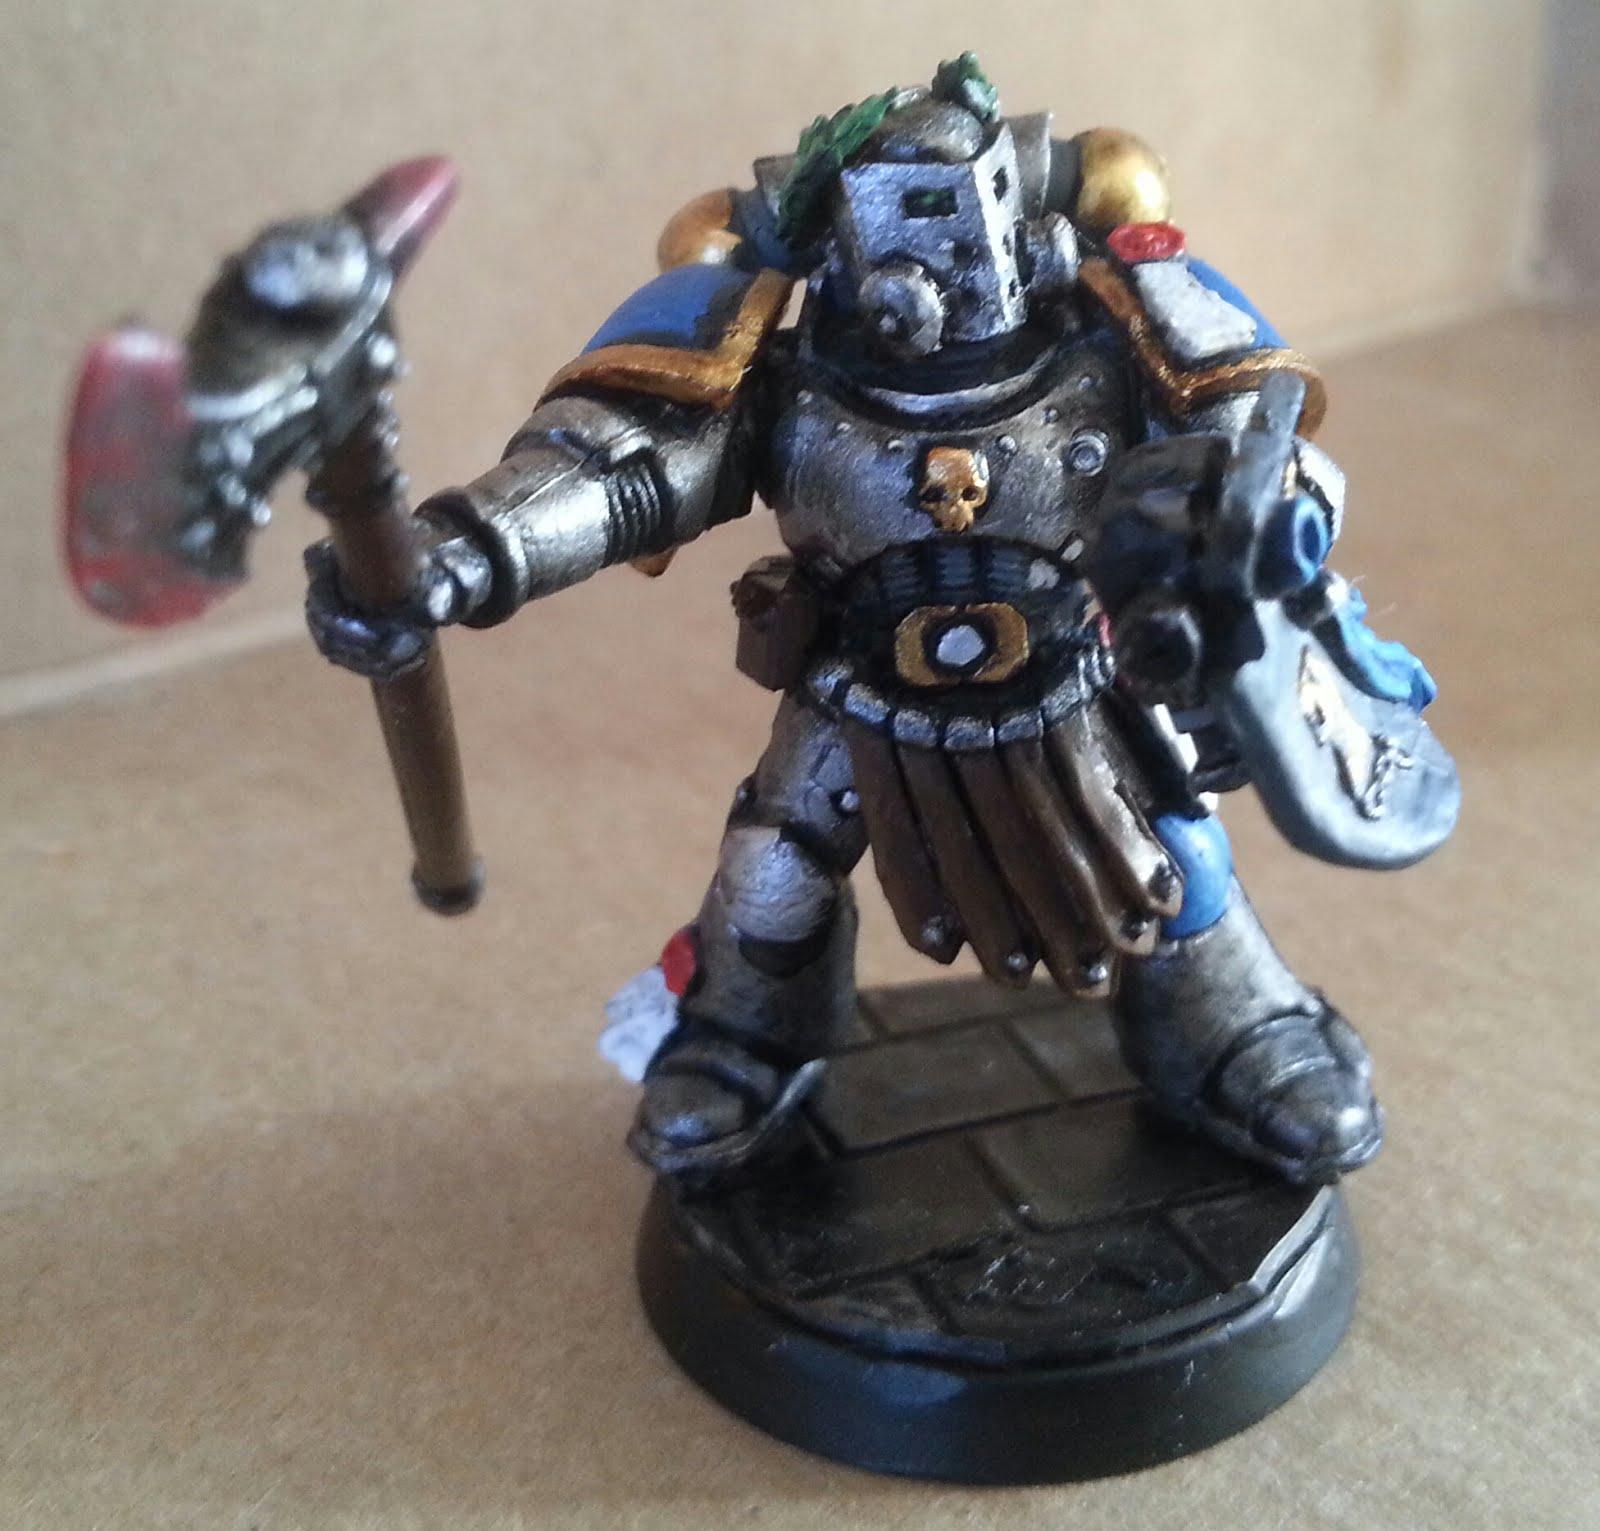 Meltaburn: Astral Claws tyrants legion minor update